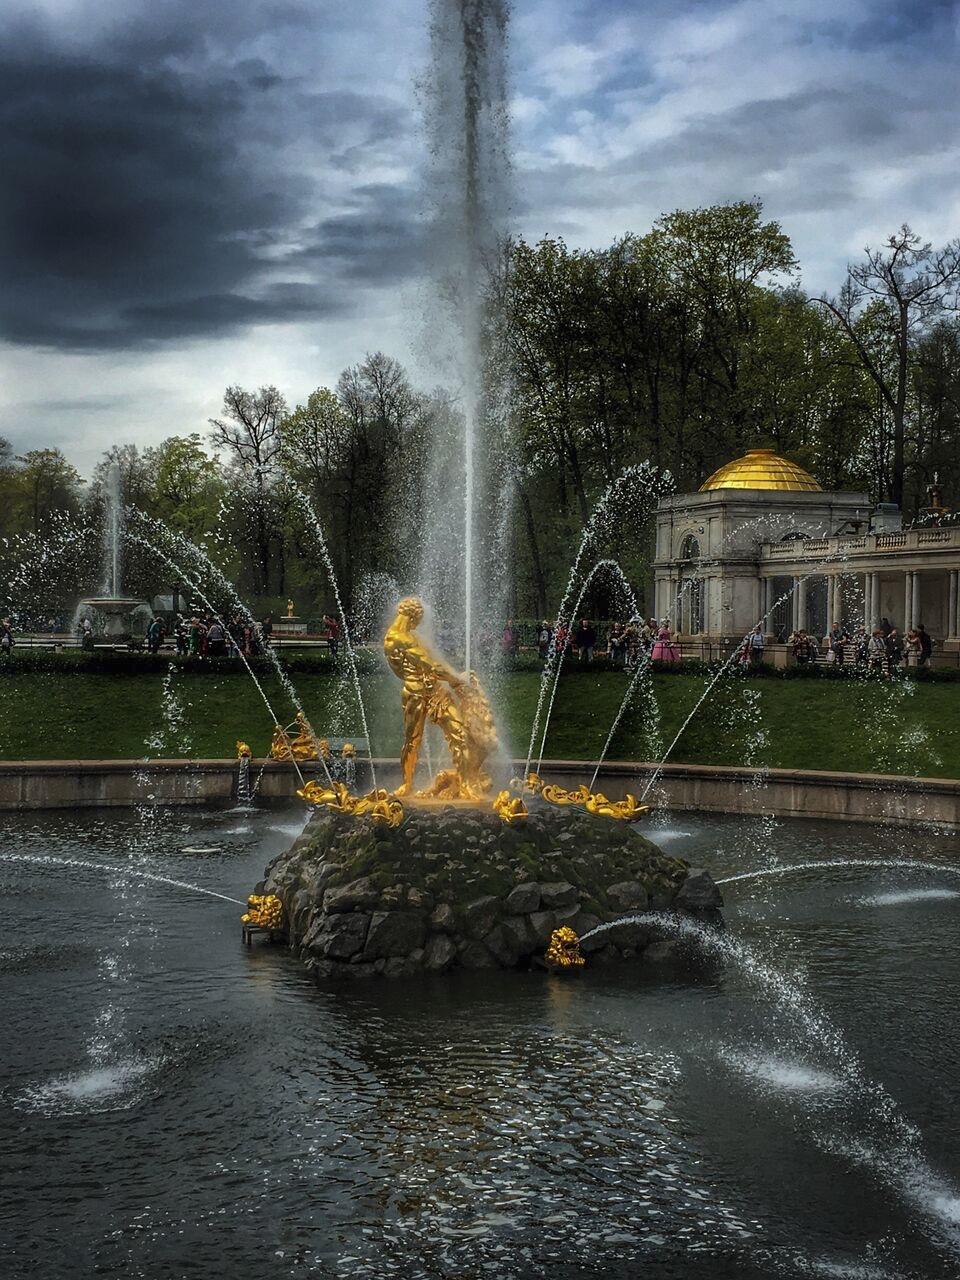 Teri_St.Petersburg_Hermitage_day2_spiritedtable_photo23.jpg